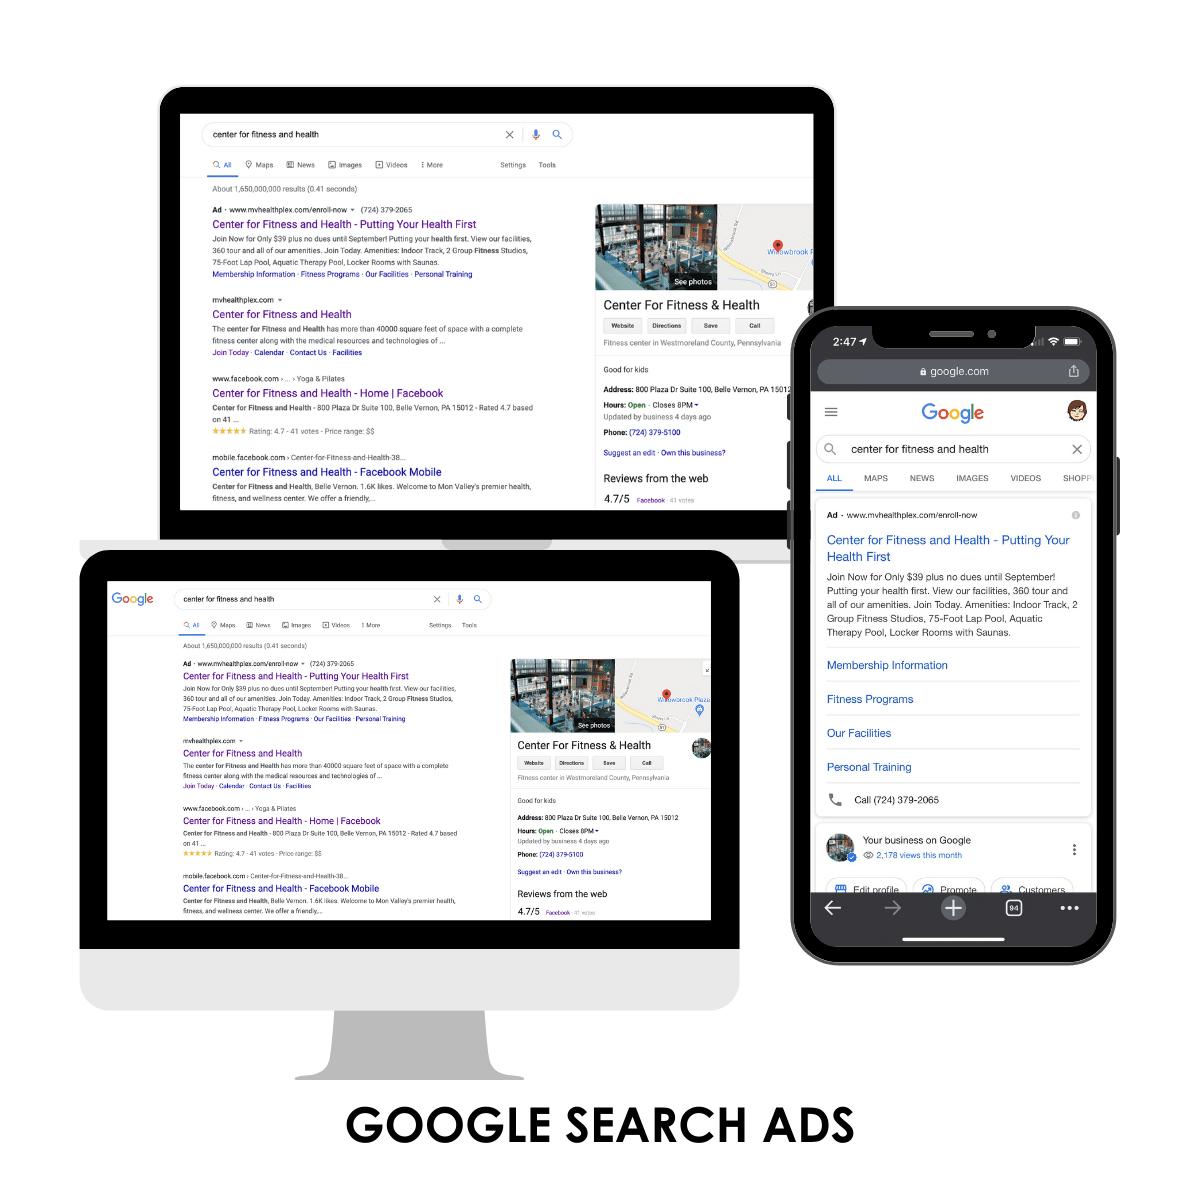 NEW TFM Website - Client Feature Block - CFH - Google Search Ads_1200x1200